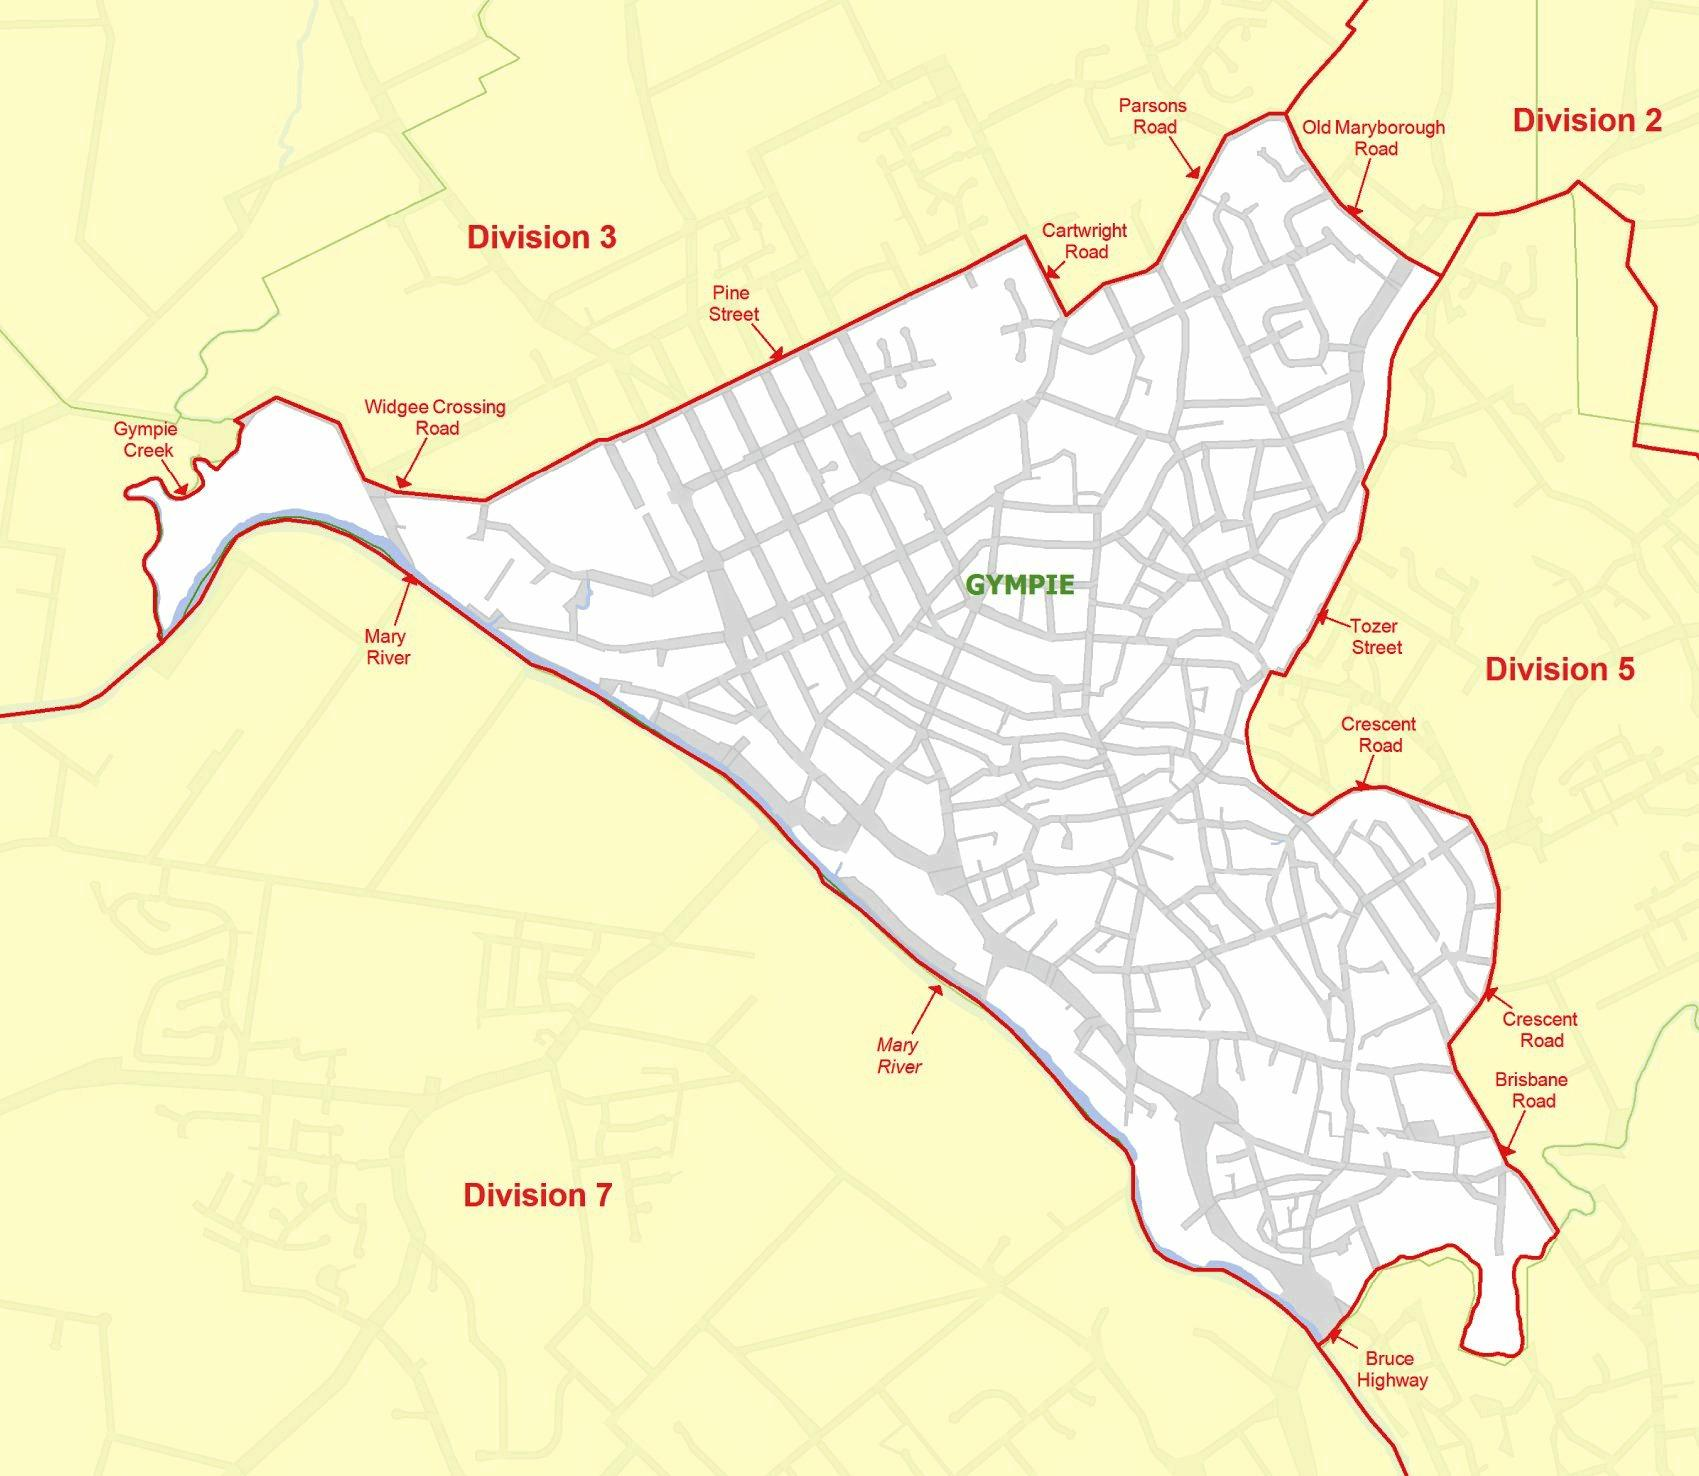 Gympie Regional Council Division 4